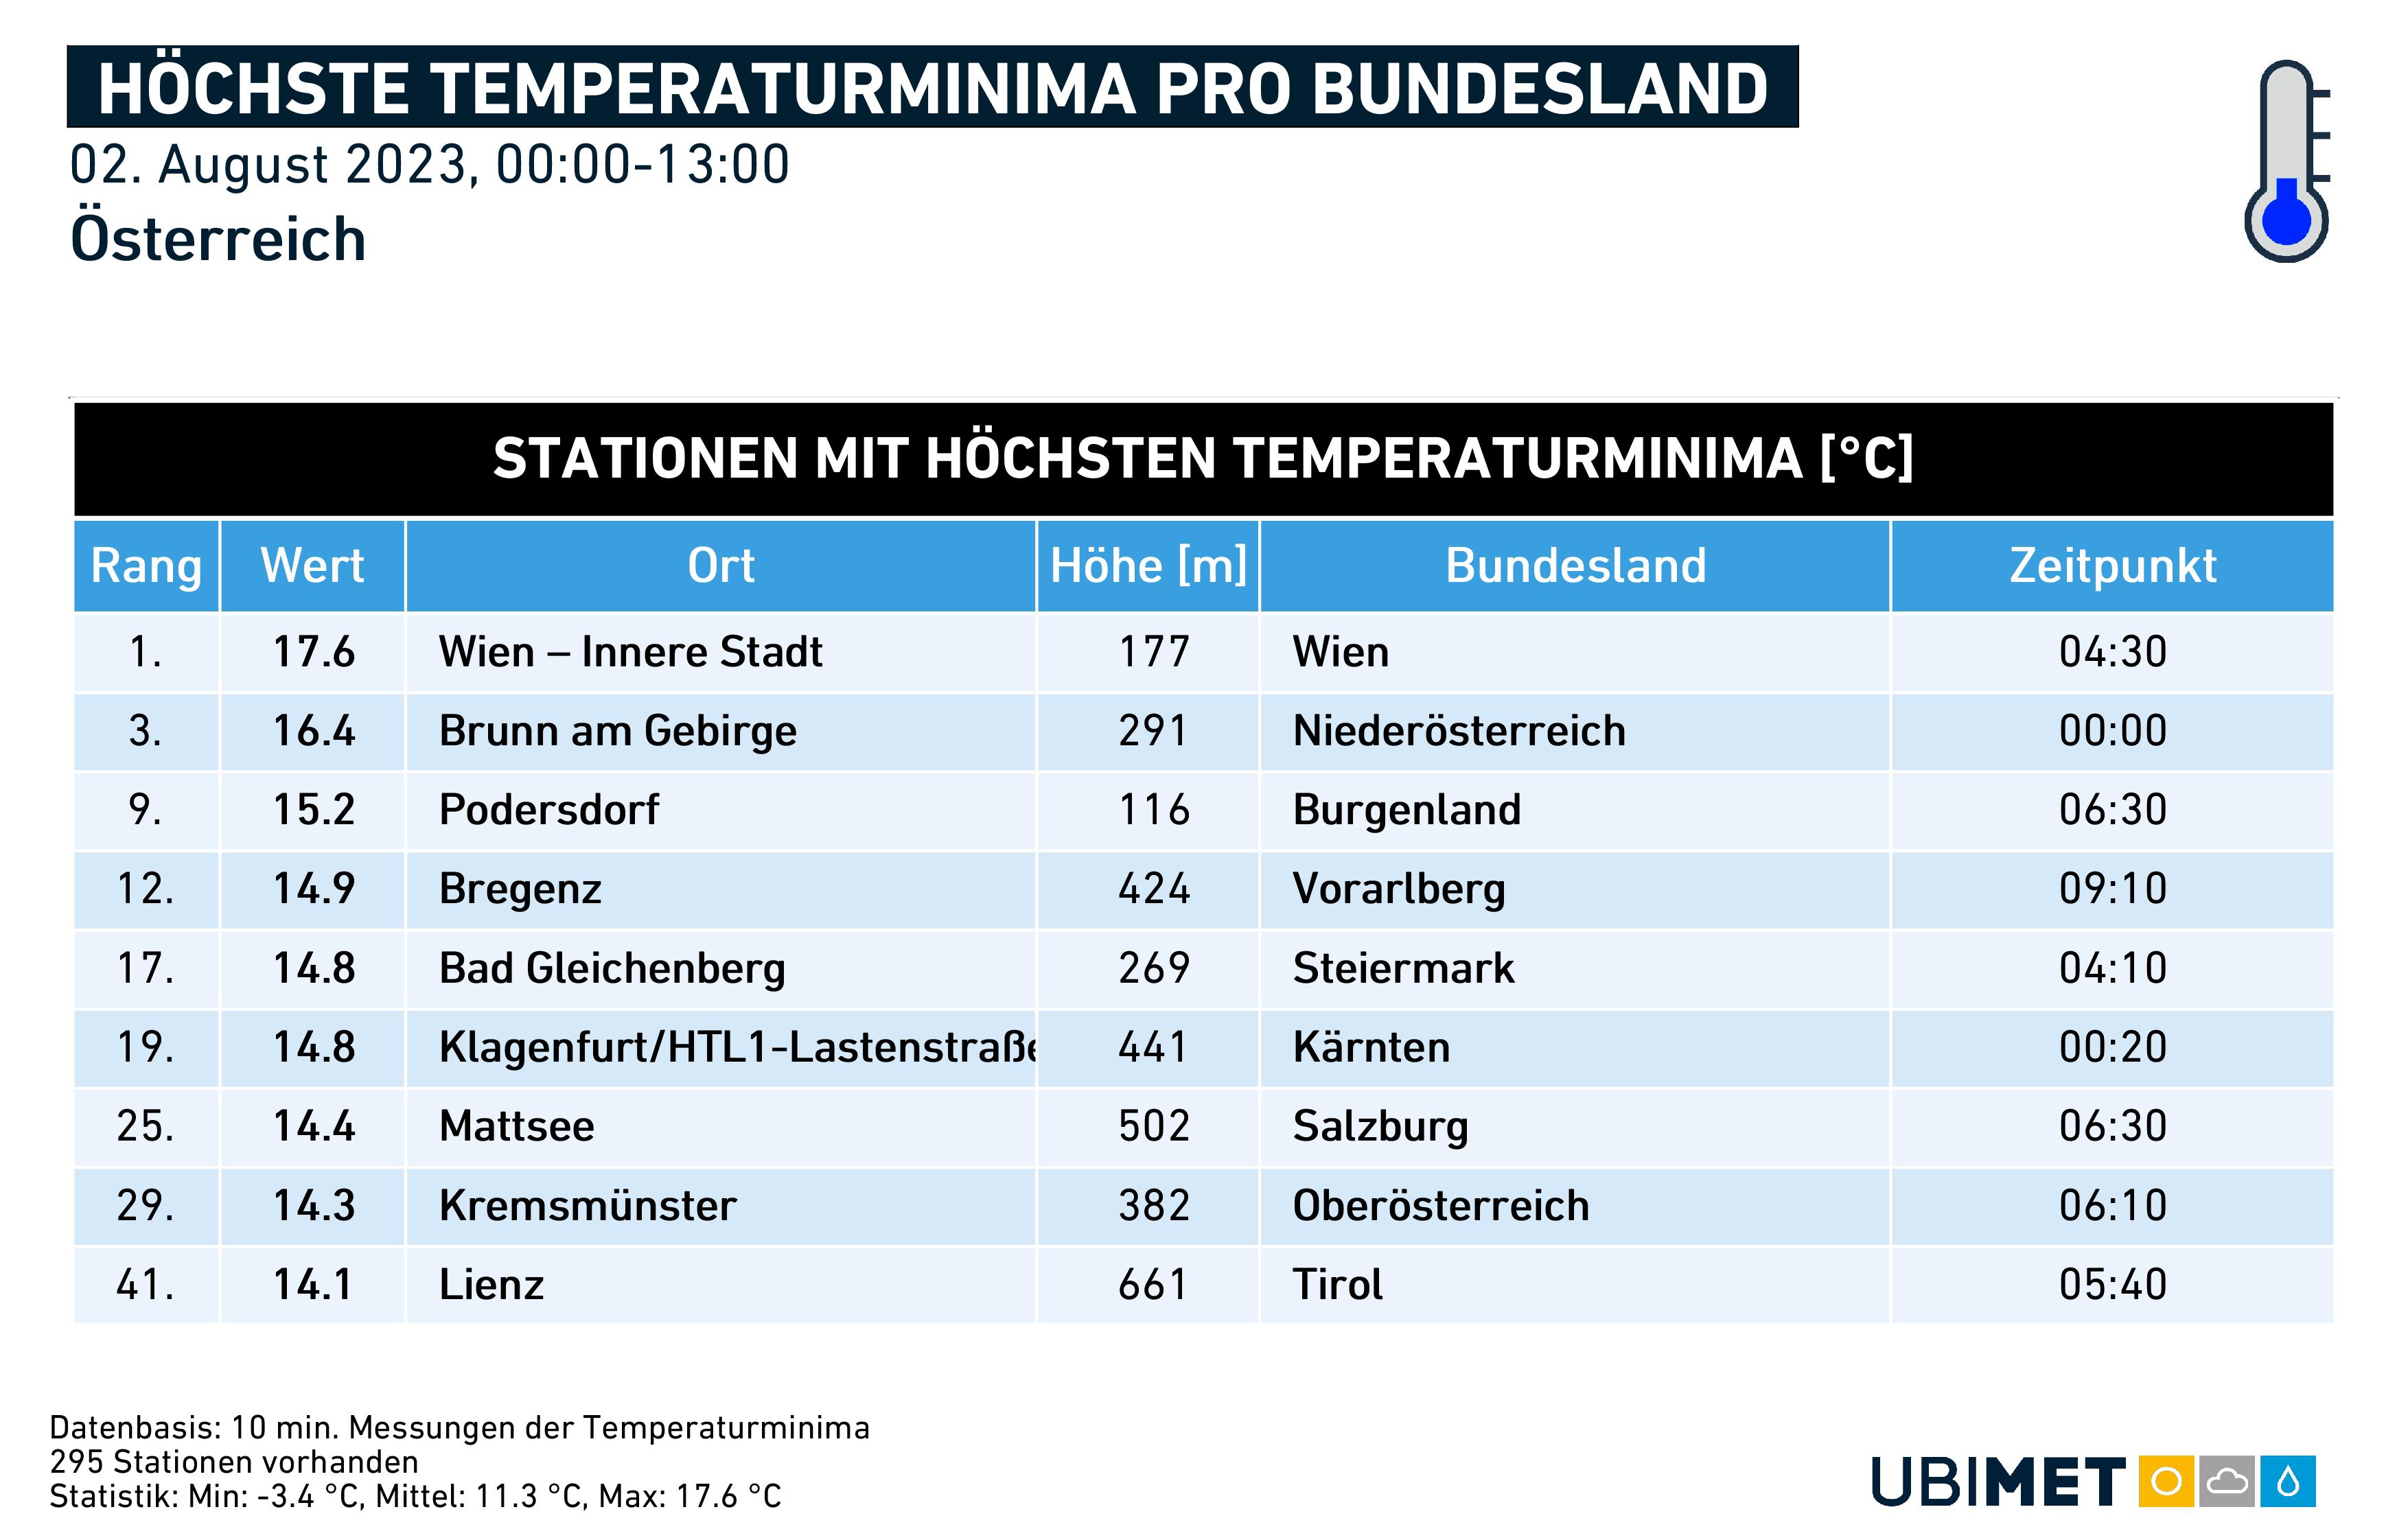 Höchste Temperaturminima pro Bundesland